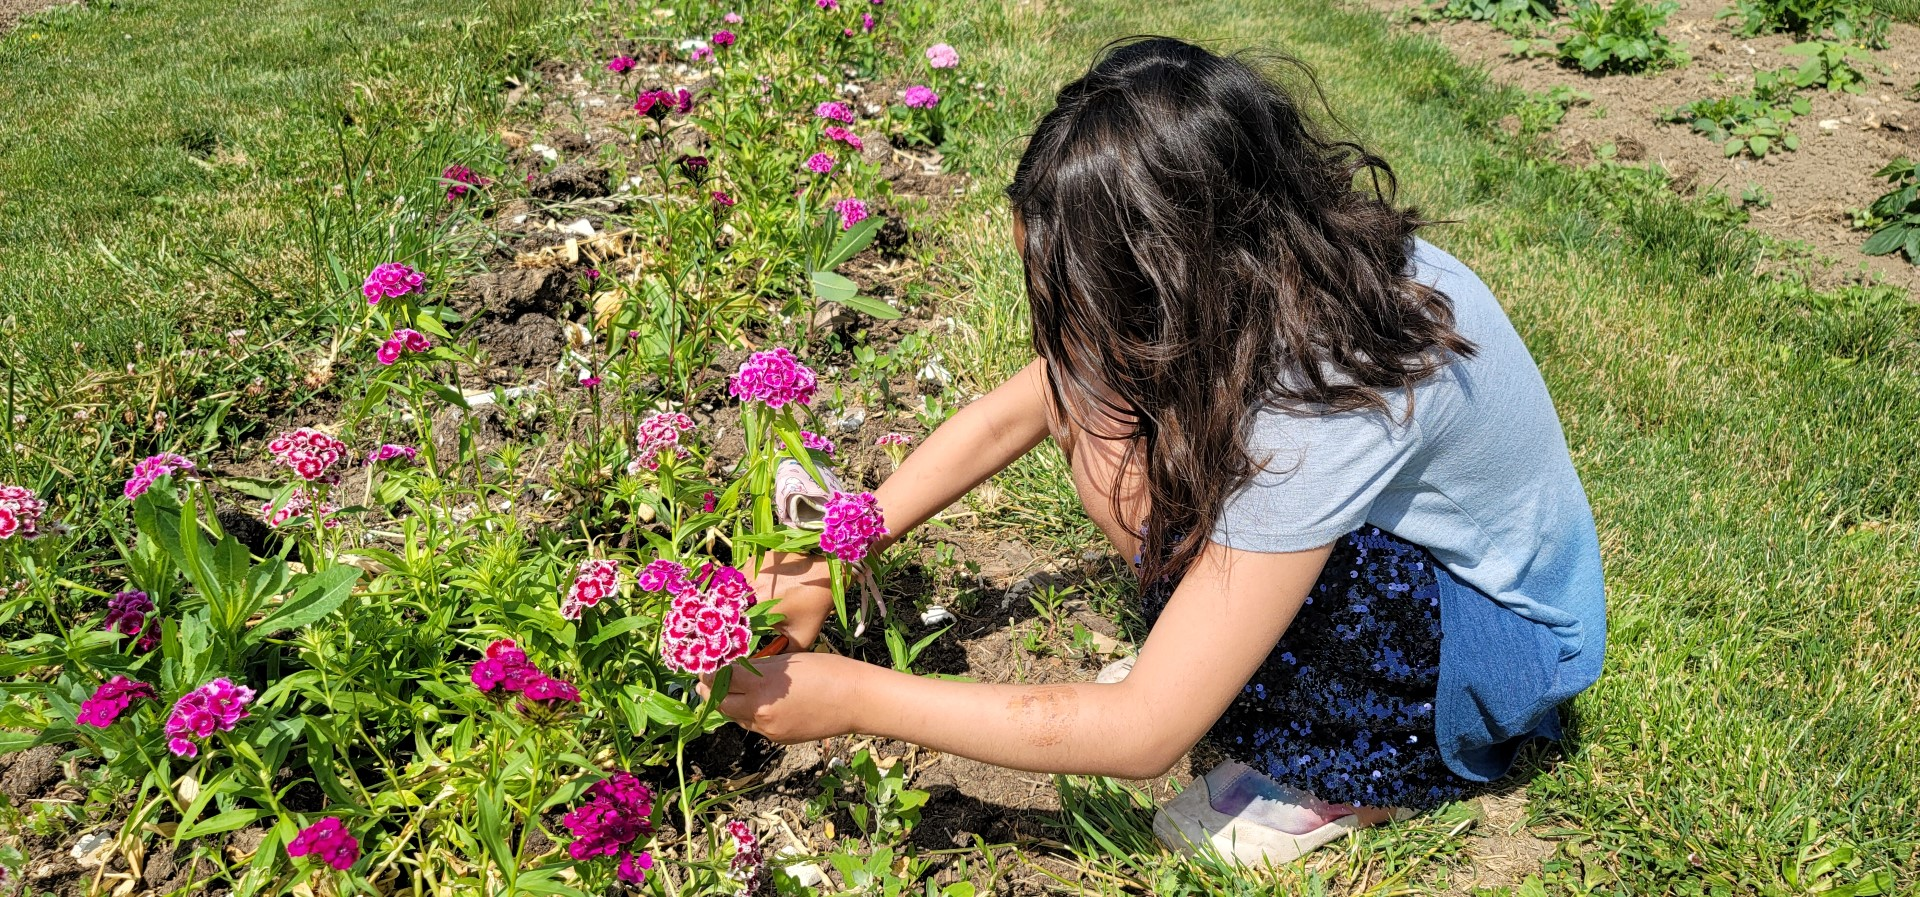 girl cutting flowers